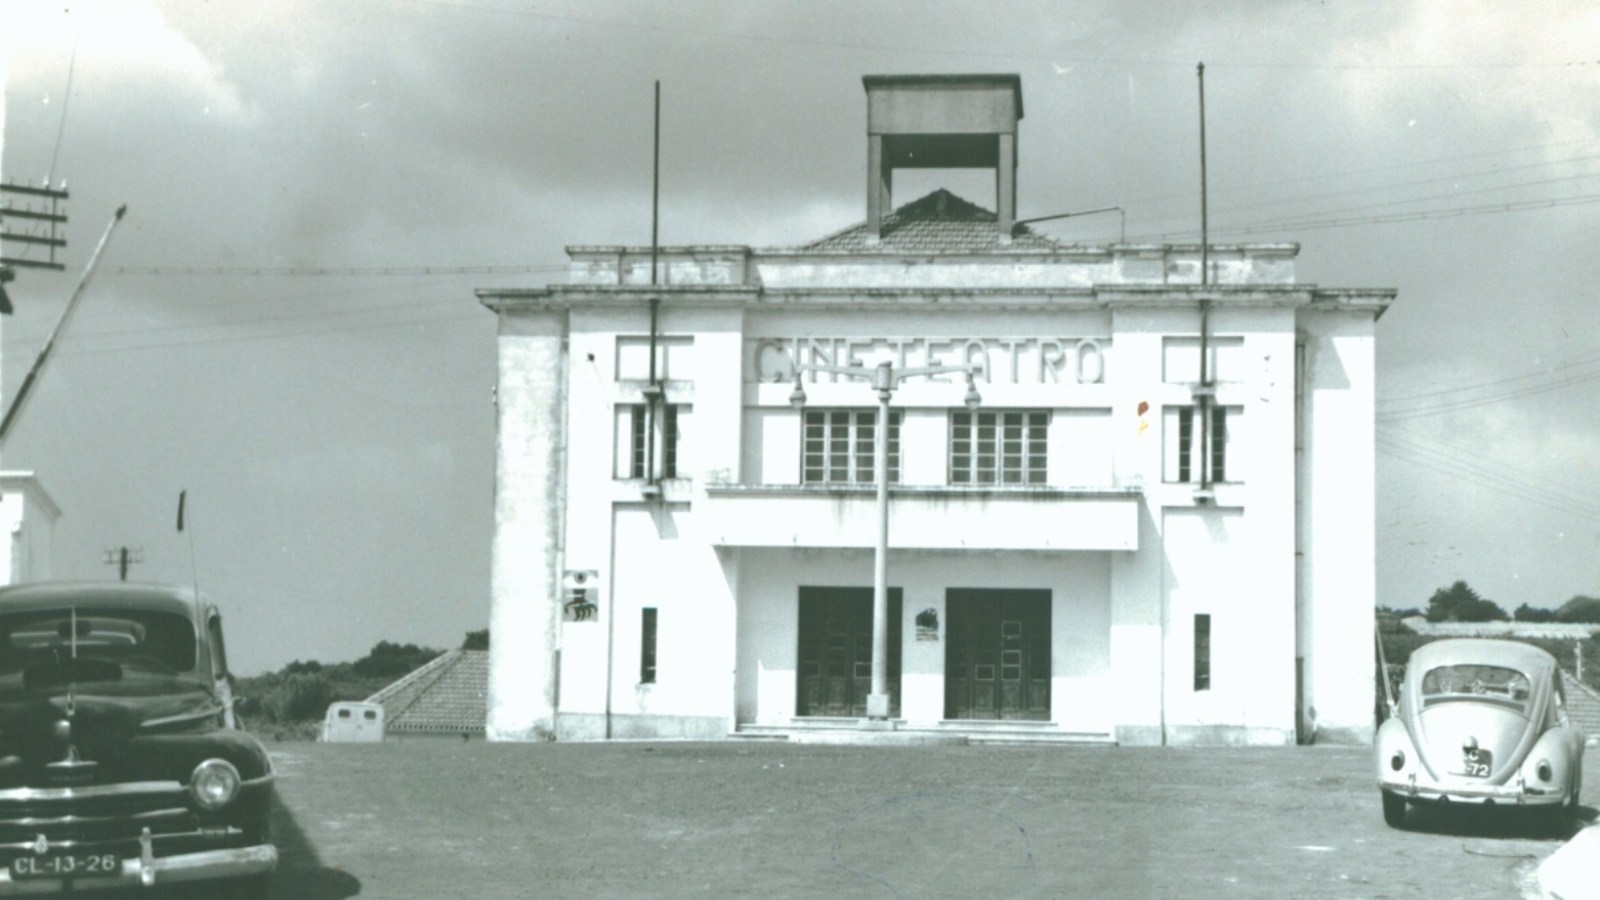 Cine-Teatro 1971